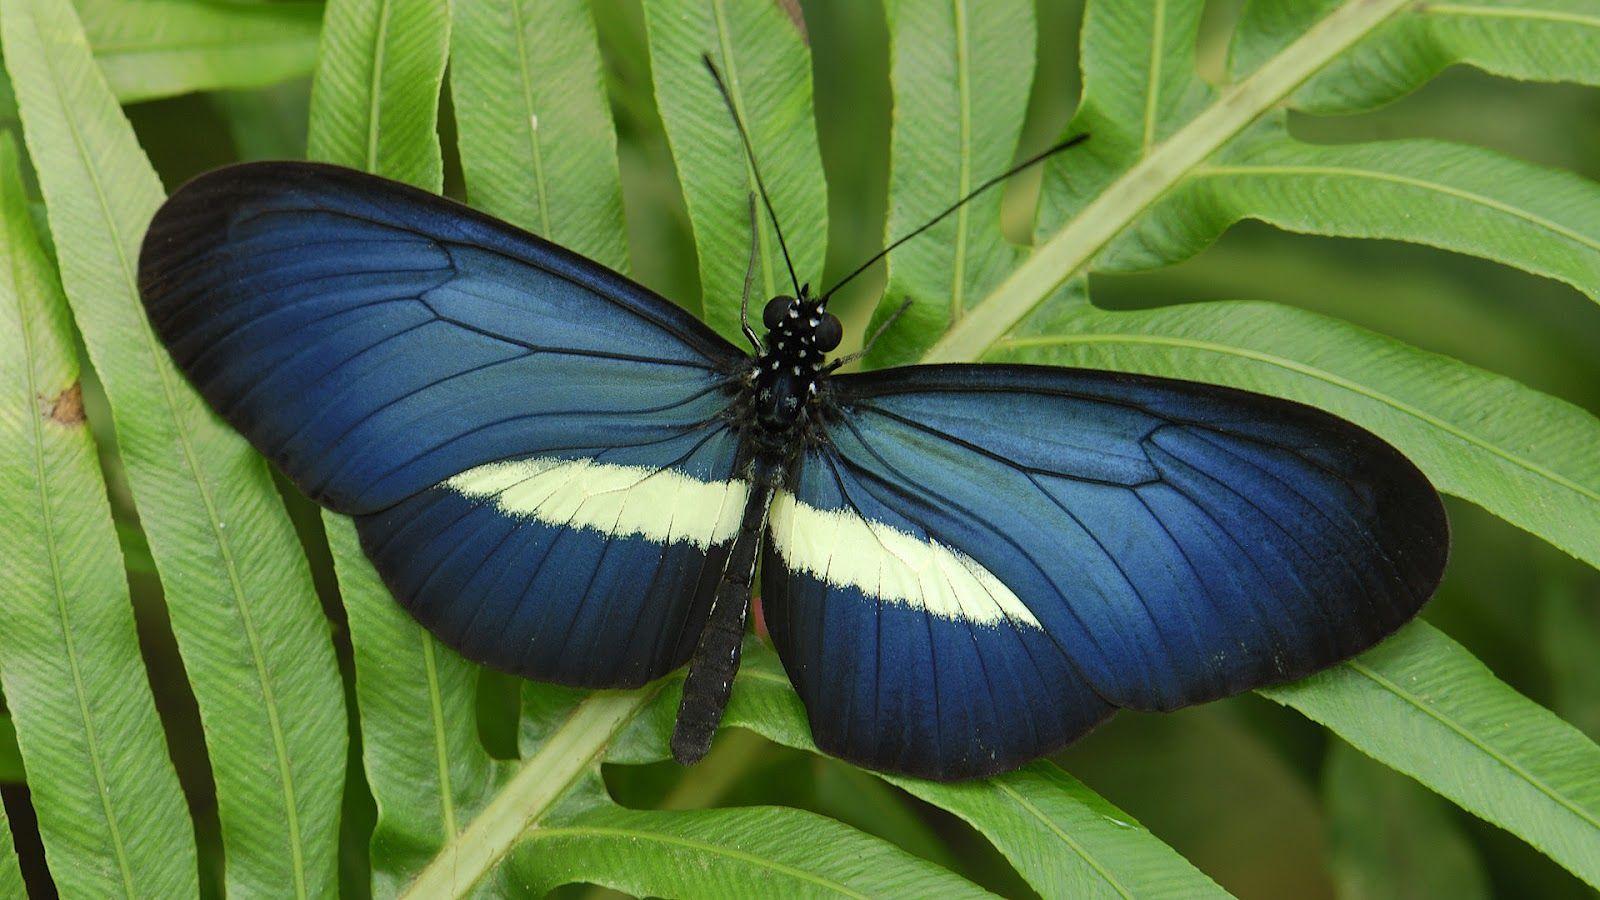 Blue butterfly on green leaf wallpaper HD Animals